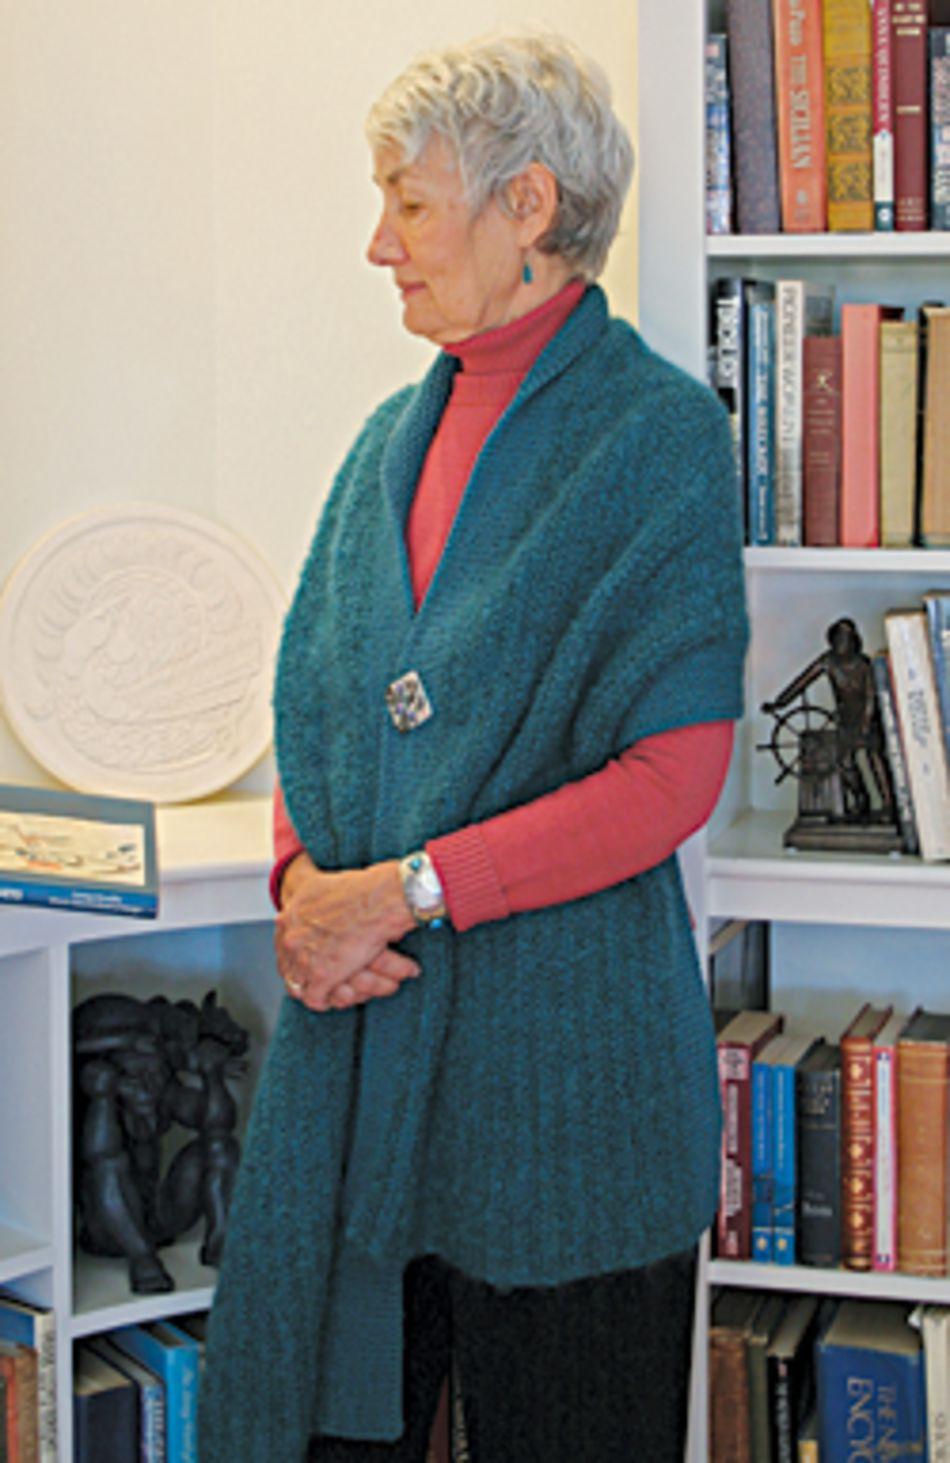 Asymmetrical 1 Button Wrap - Botanica and Boucle, Knitting Pattern ...